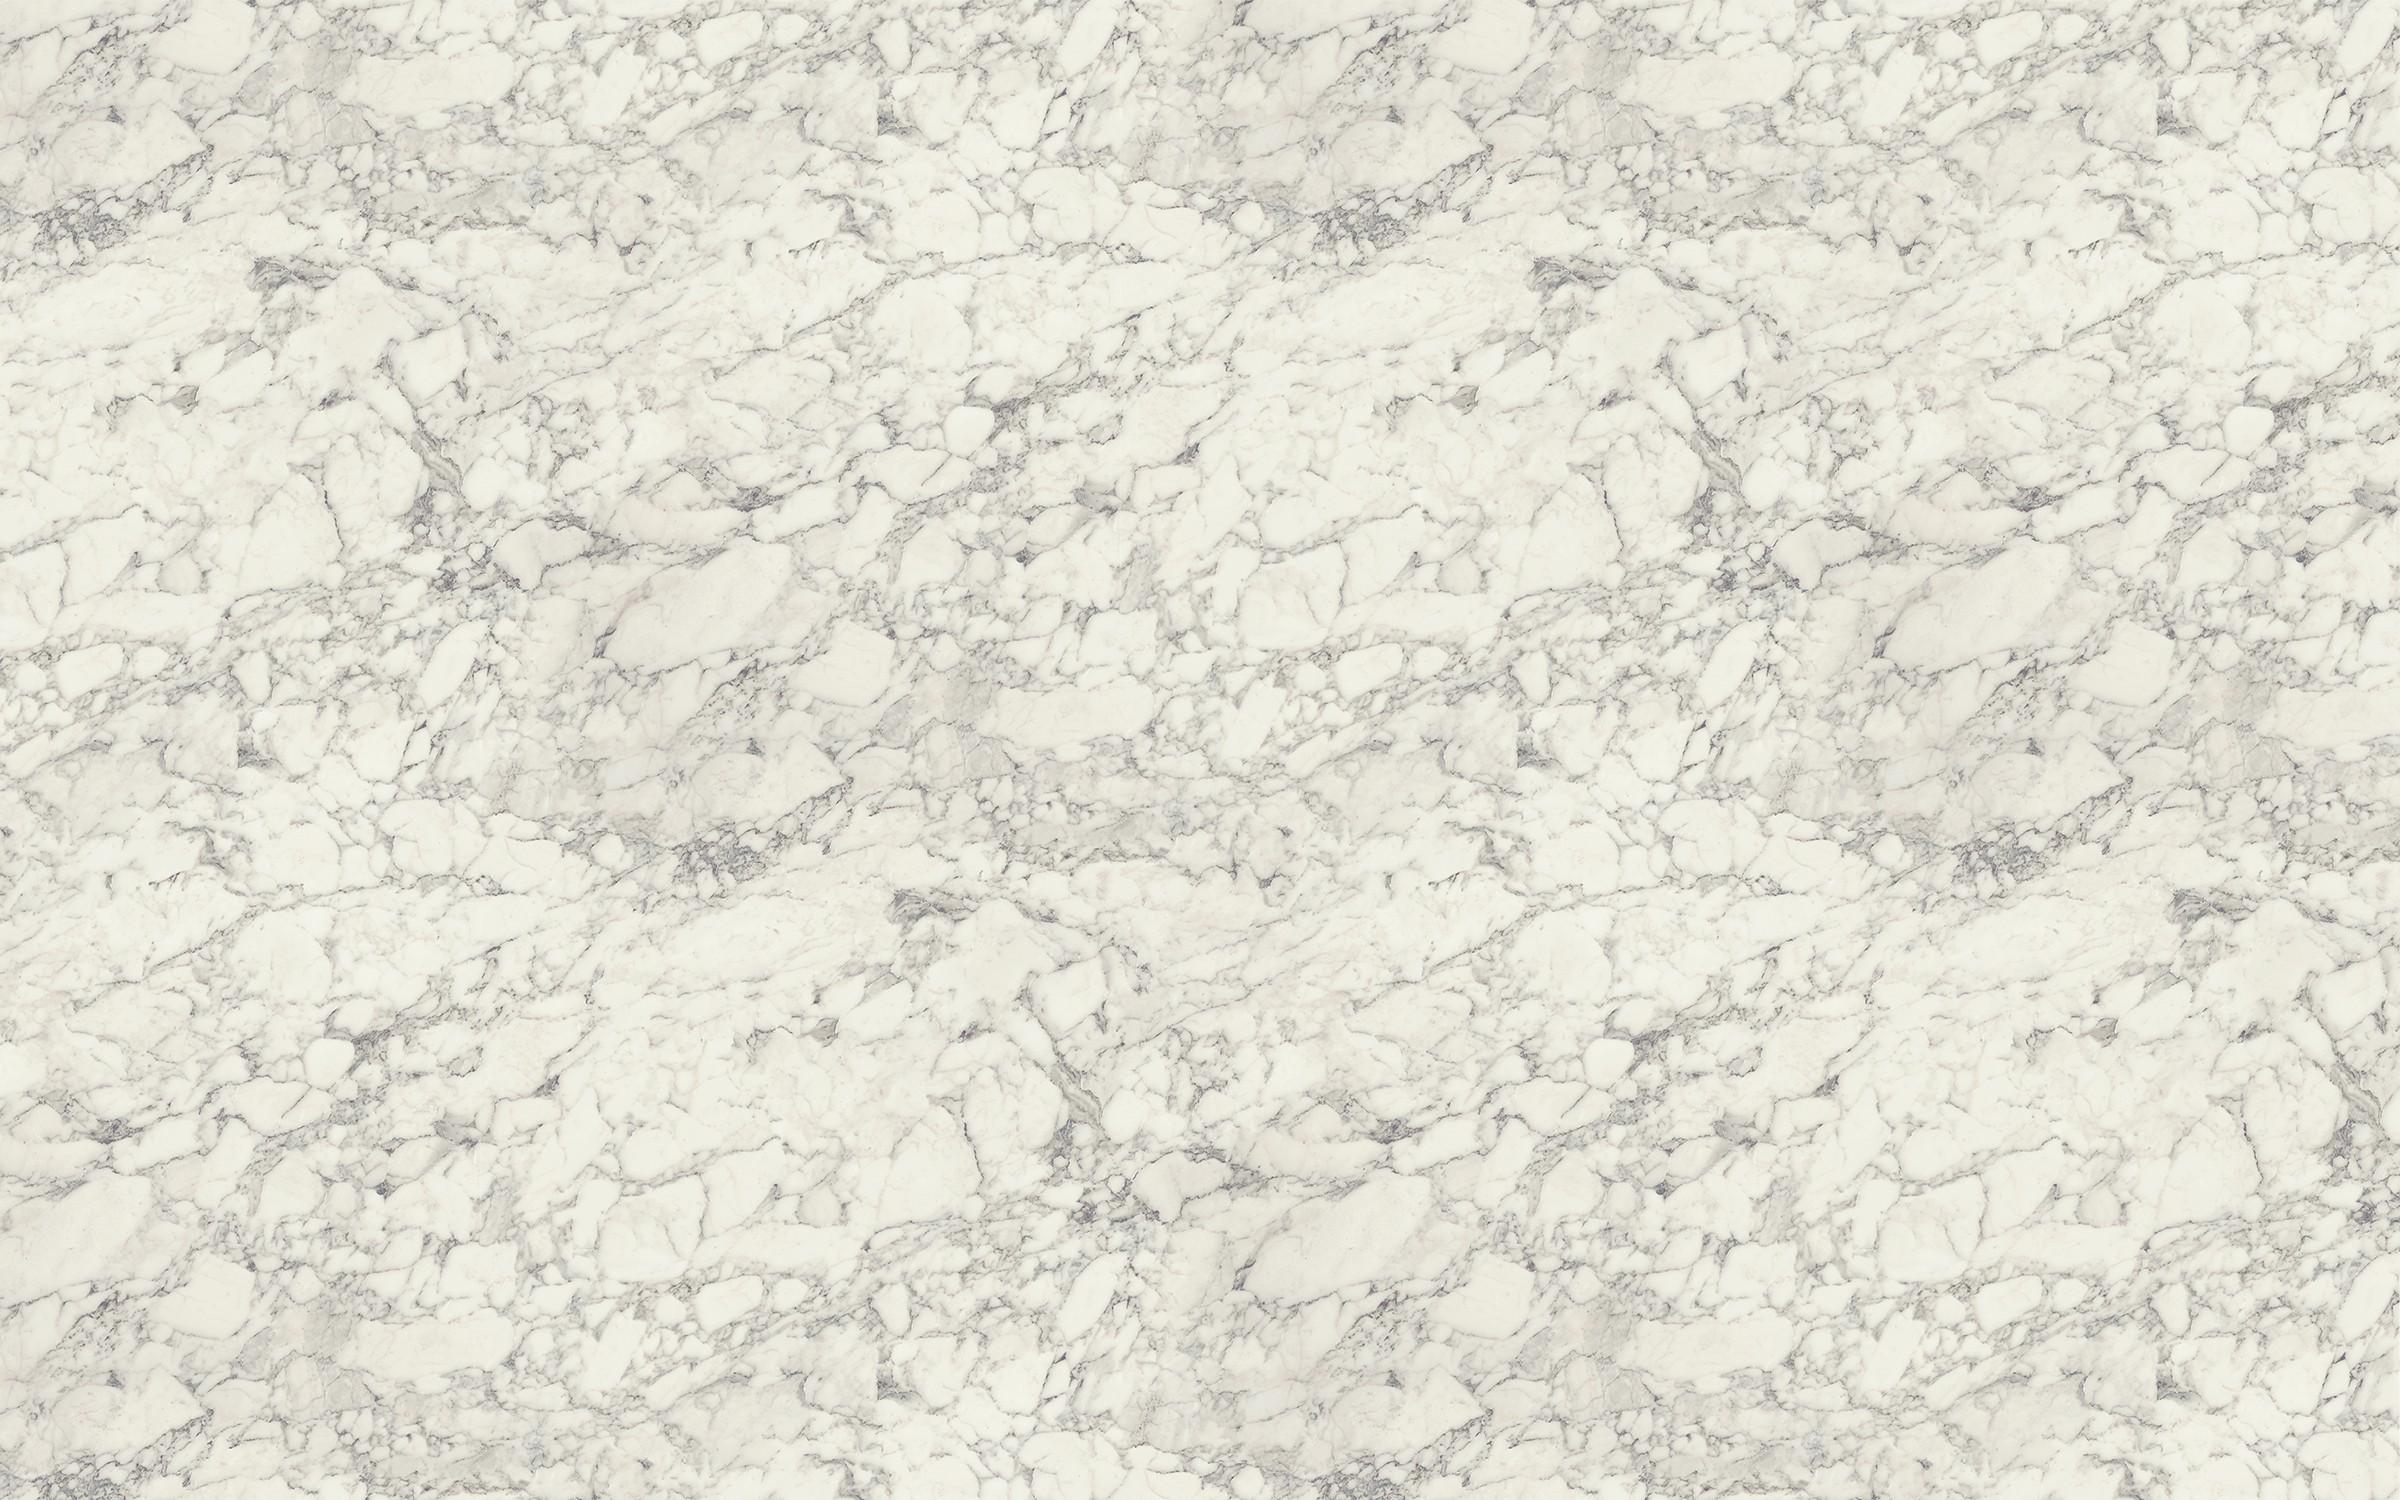 Marmo Bianco 1885